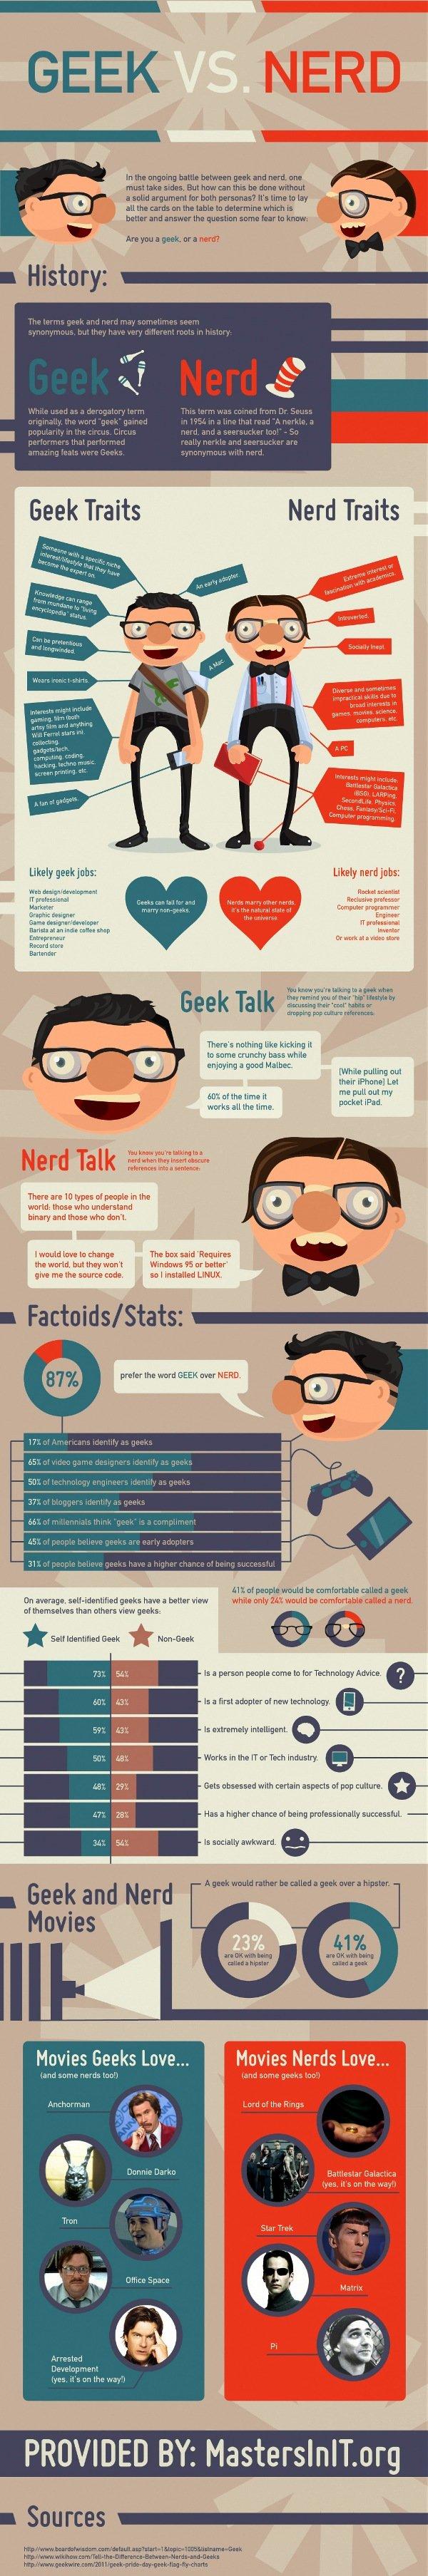 geek vs nerds #infographic